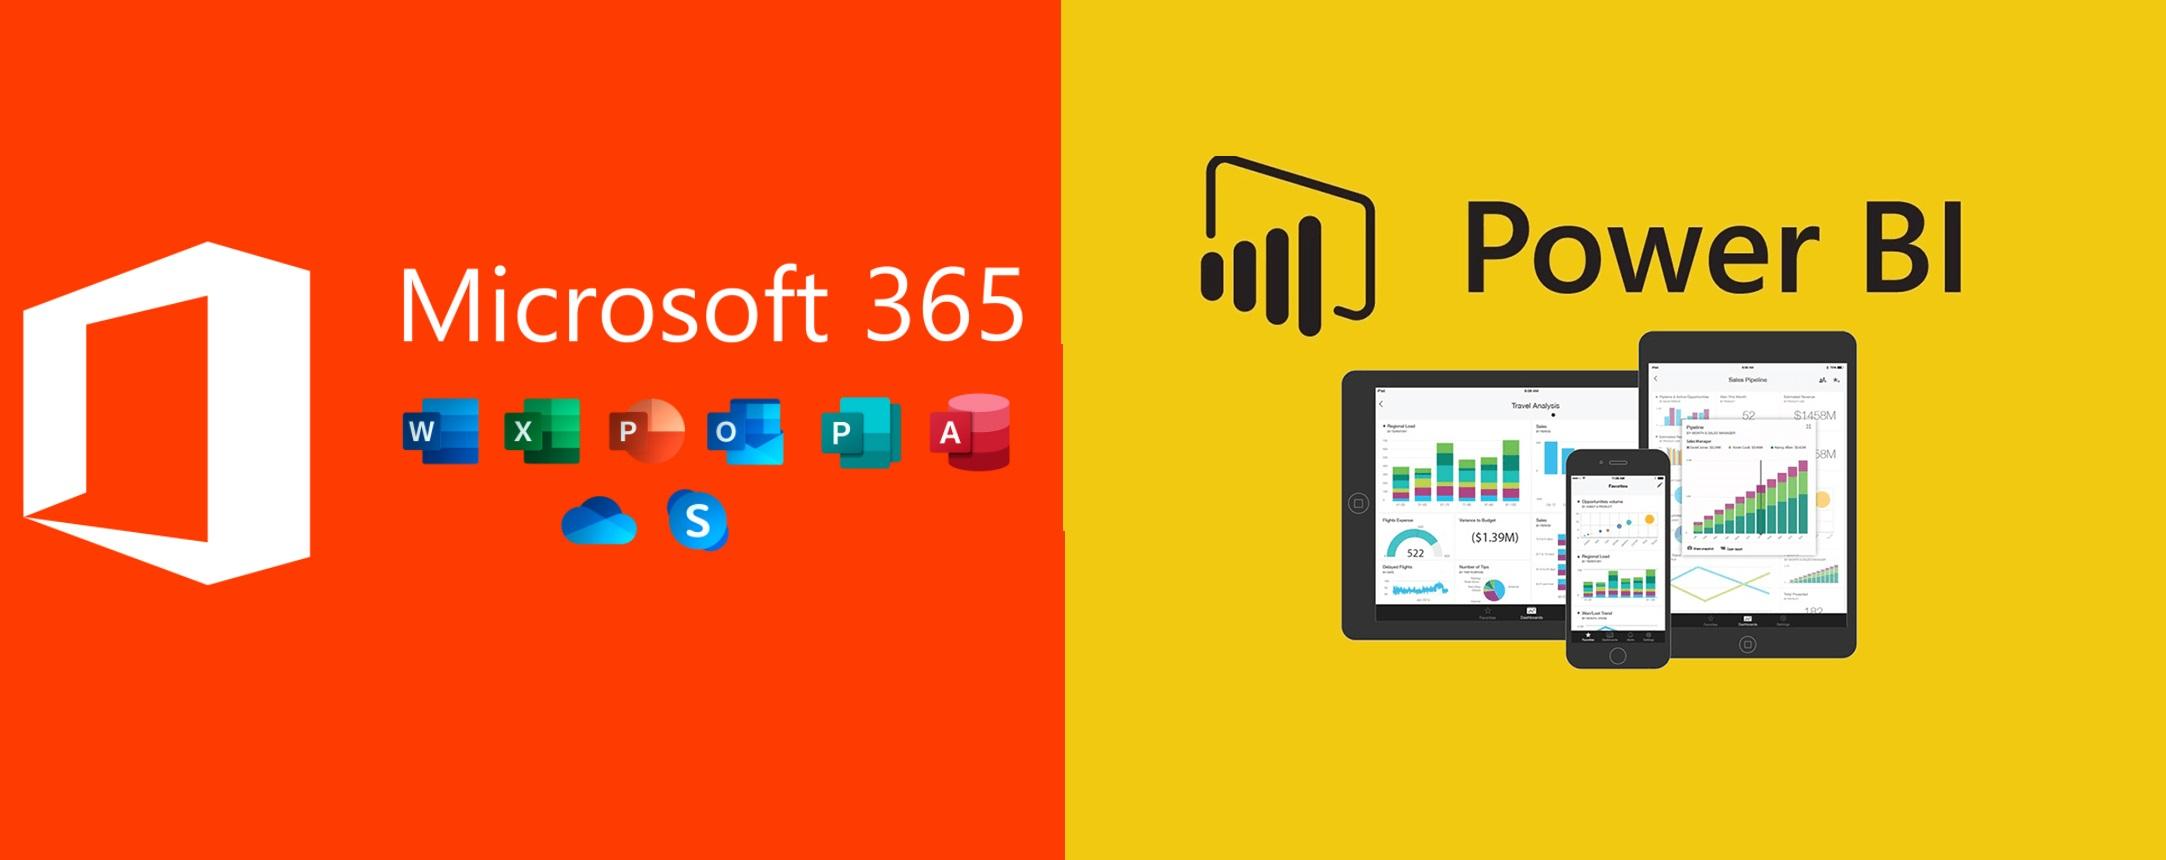 Microsoft 365 + MS Power BI Essencial